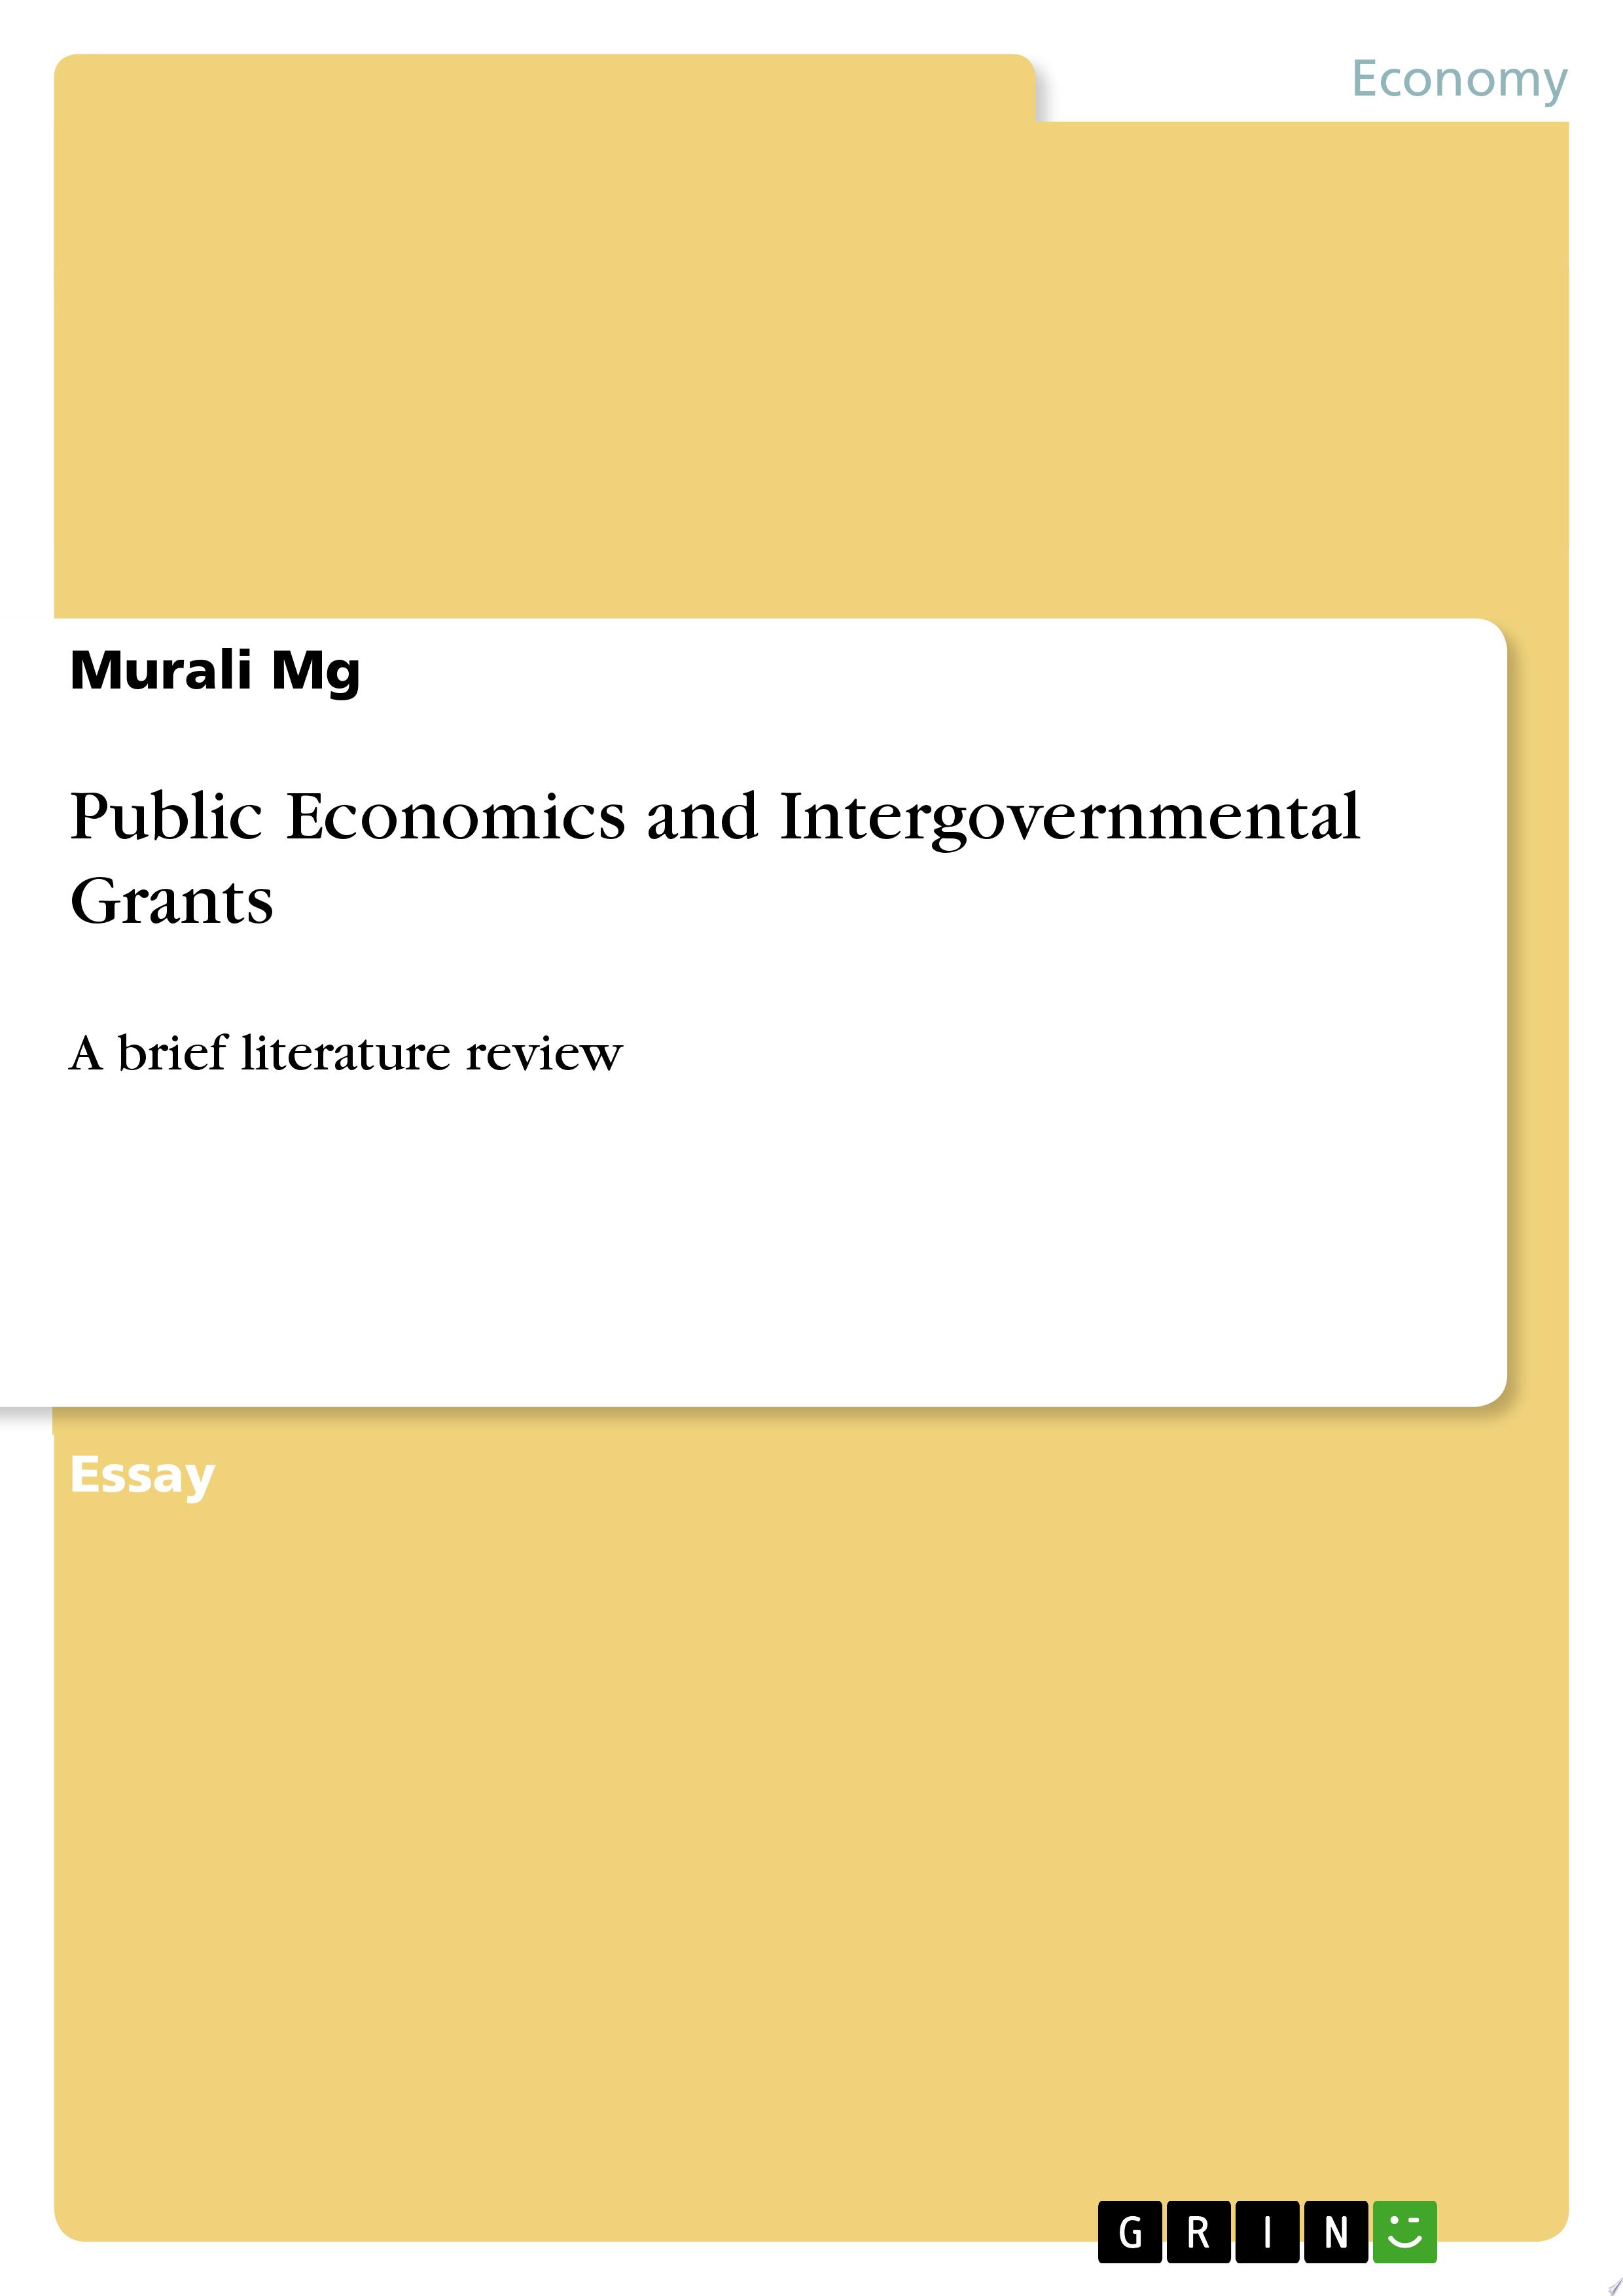 Public Economics and Intergovernmental Grants